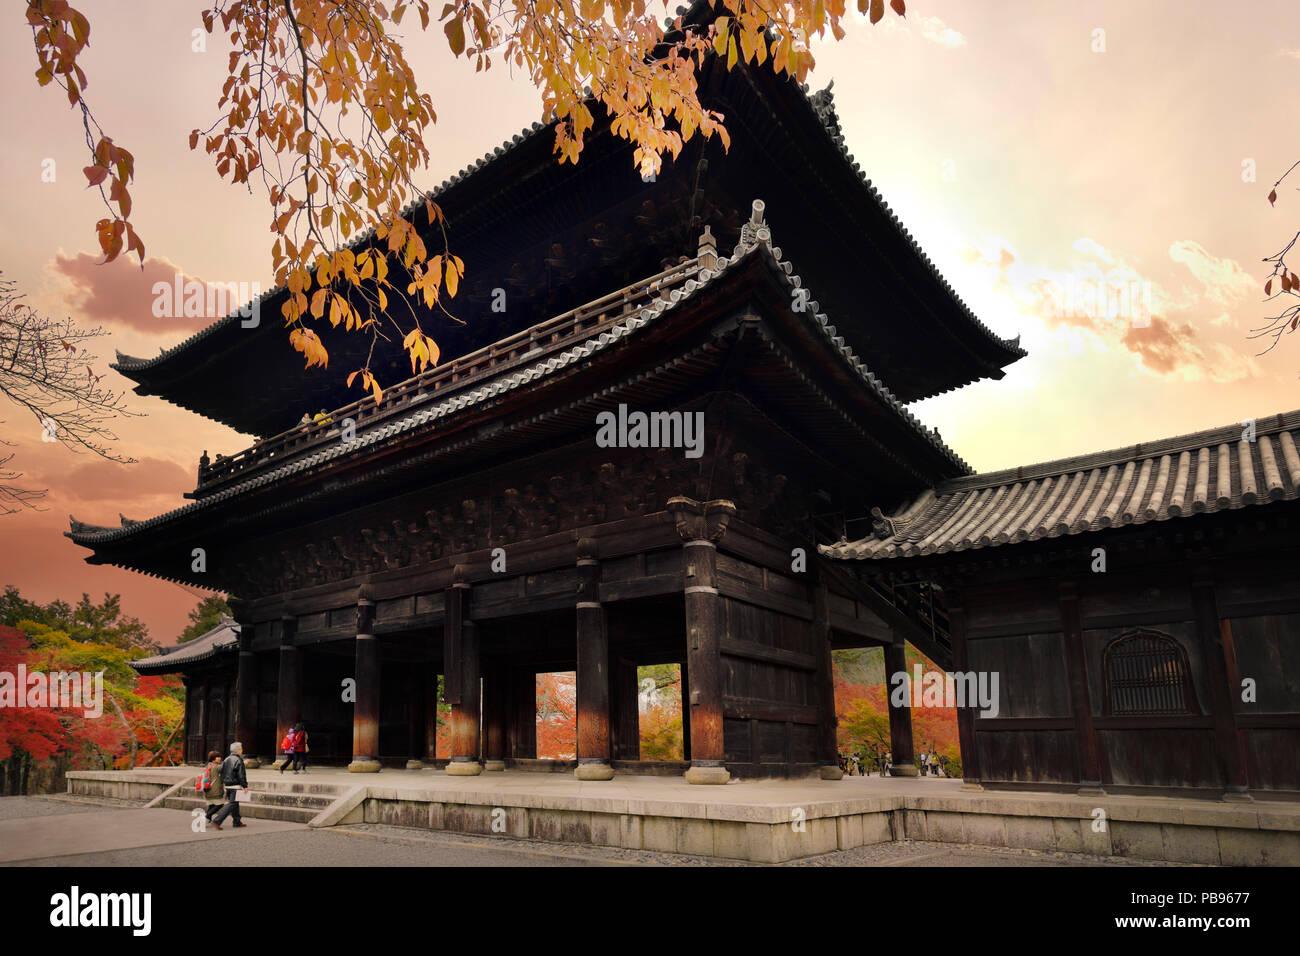 The Sanmon, San-mon, the main gate of Nanzen-ji historic Zen Buddhist temple in Sakyo-ku, Kyoto, Japan 2017 - Stock Image